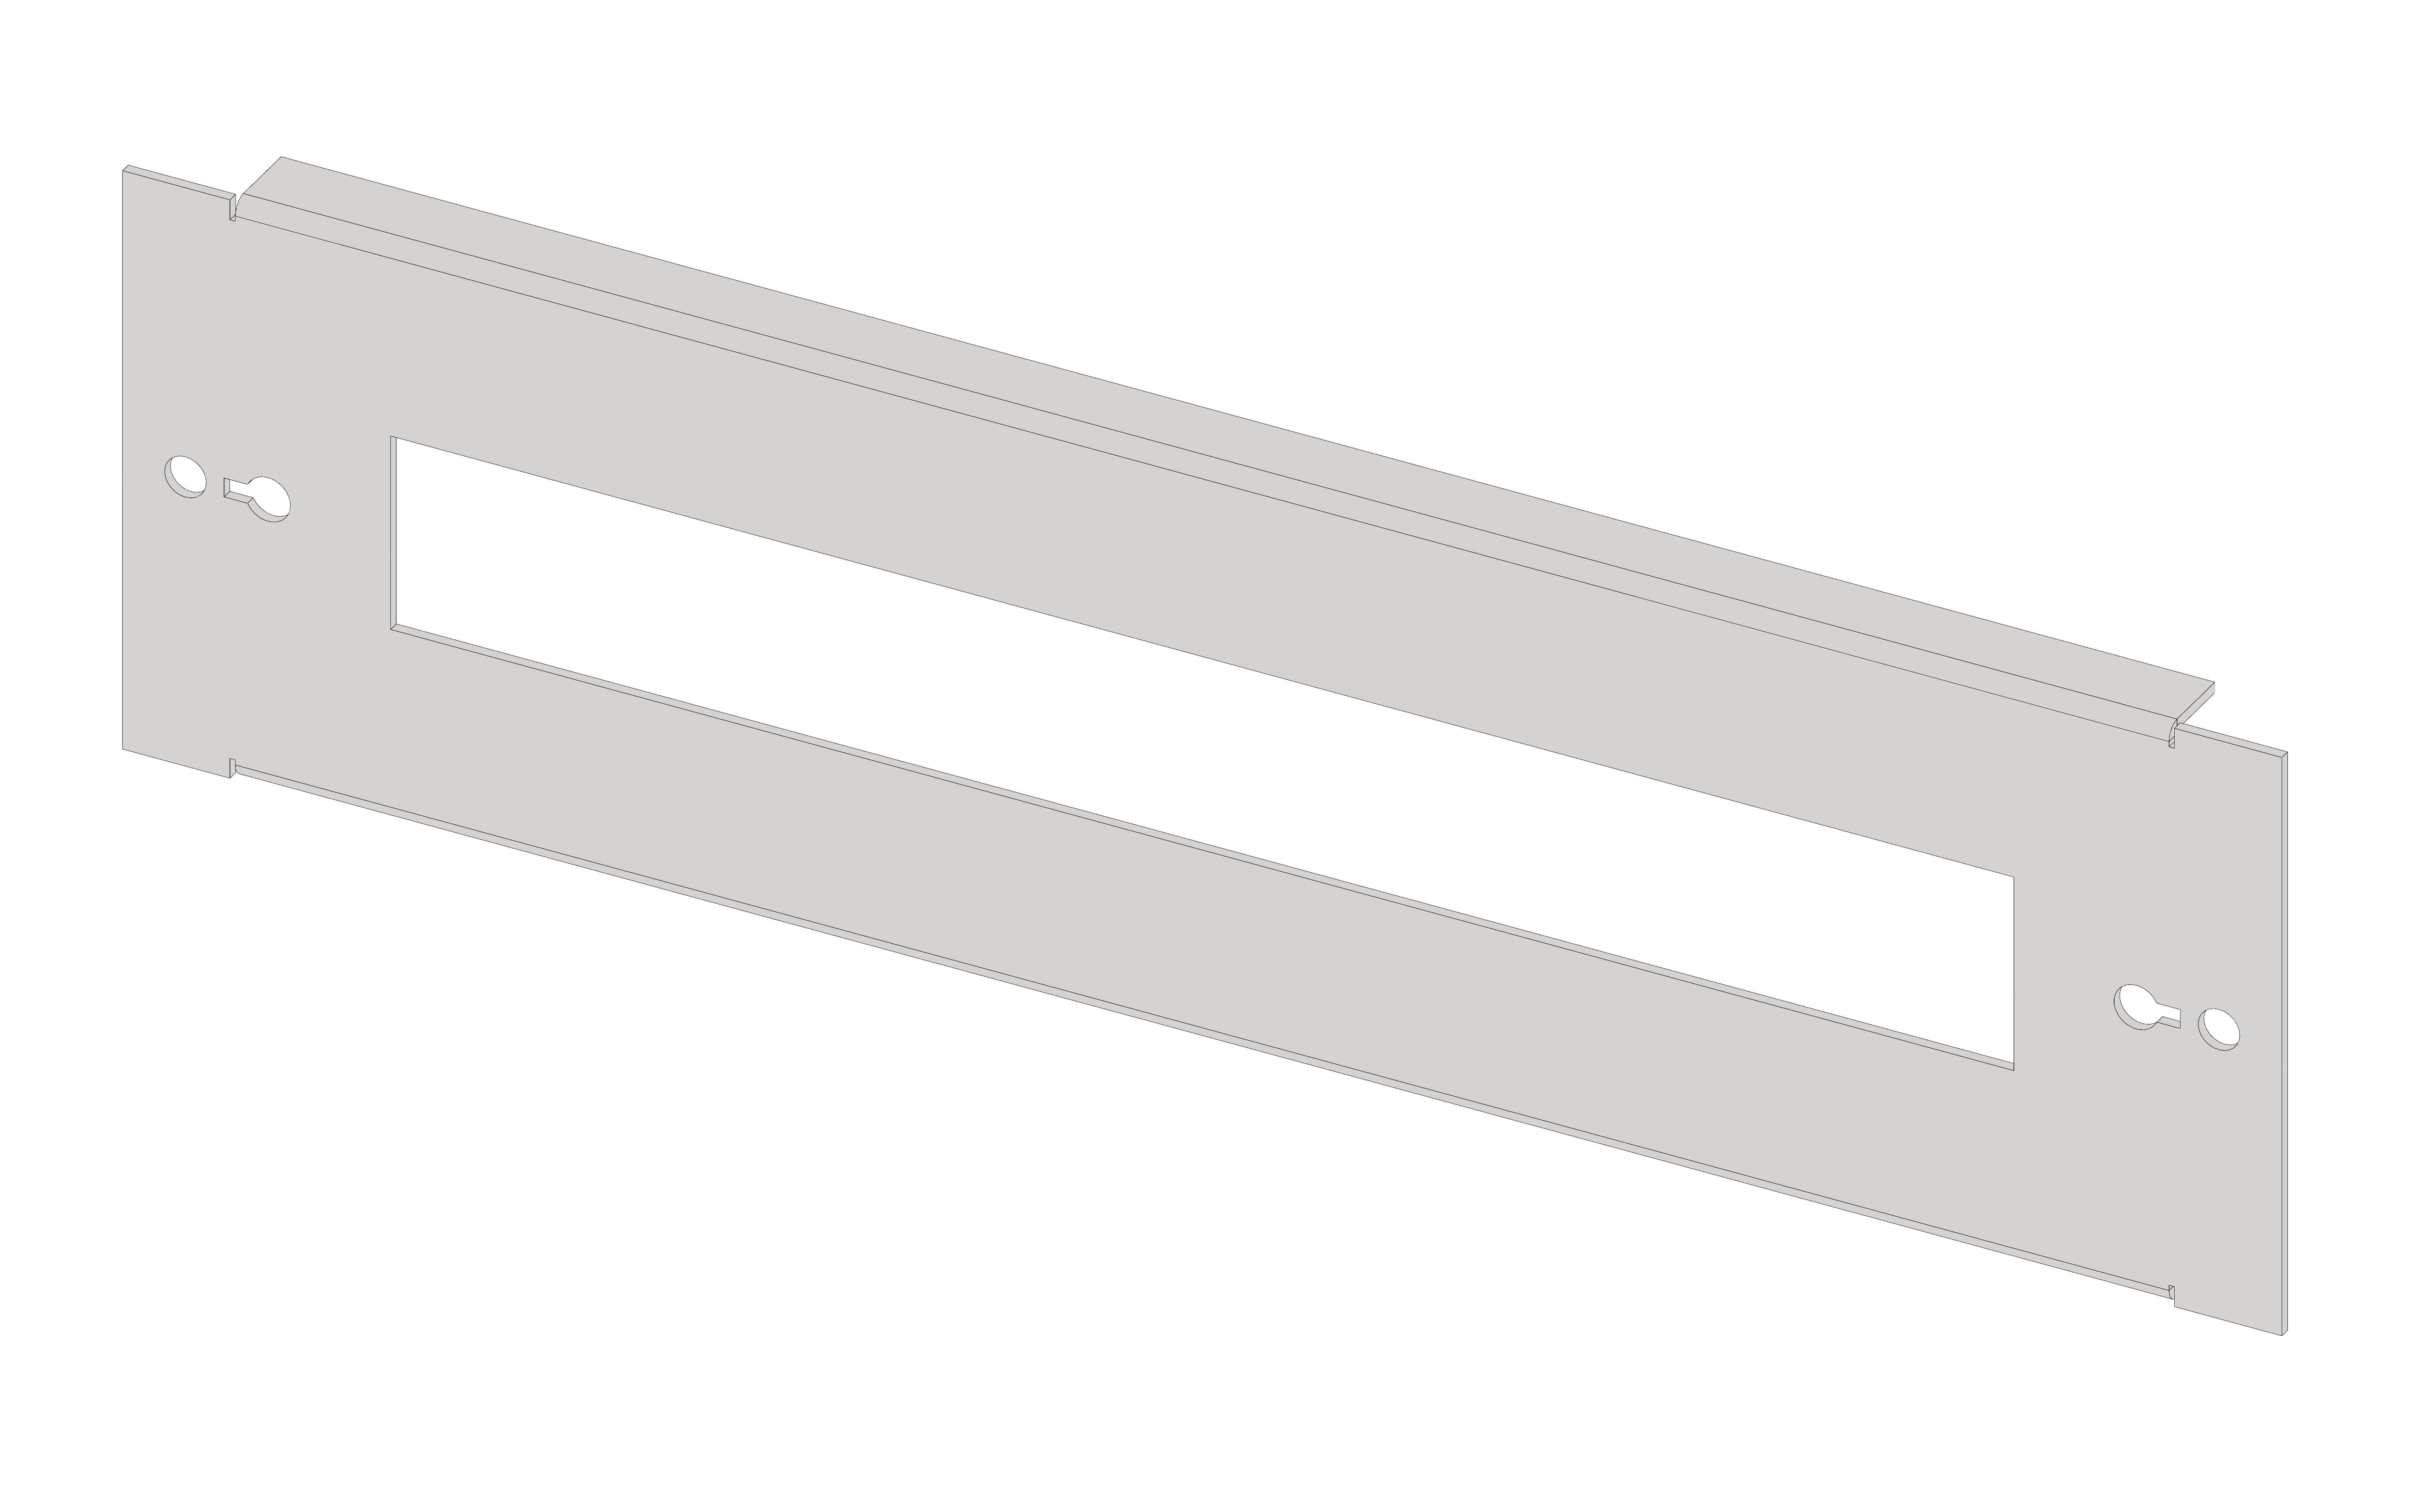 1 Stk Gerätefrontplatte 2G3K Kunststoff IL061203-H